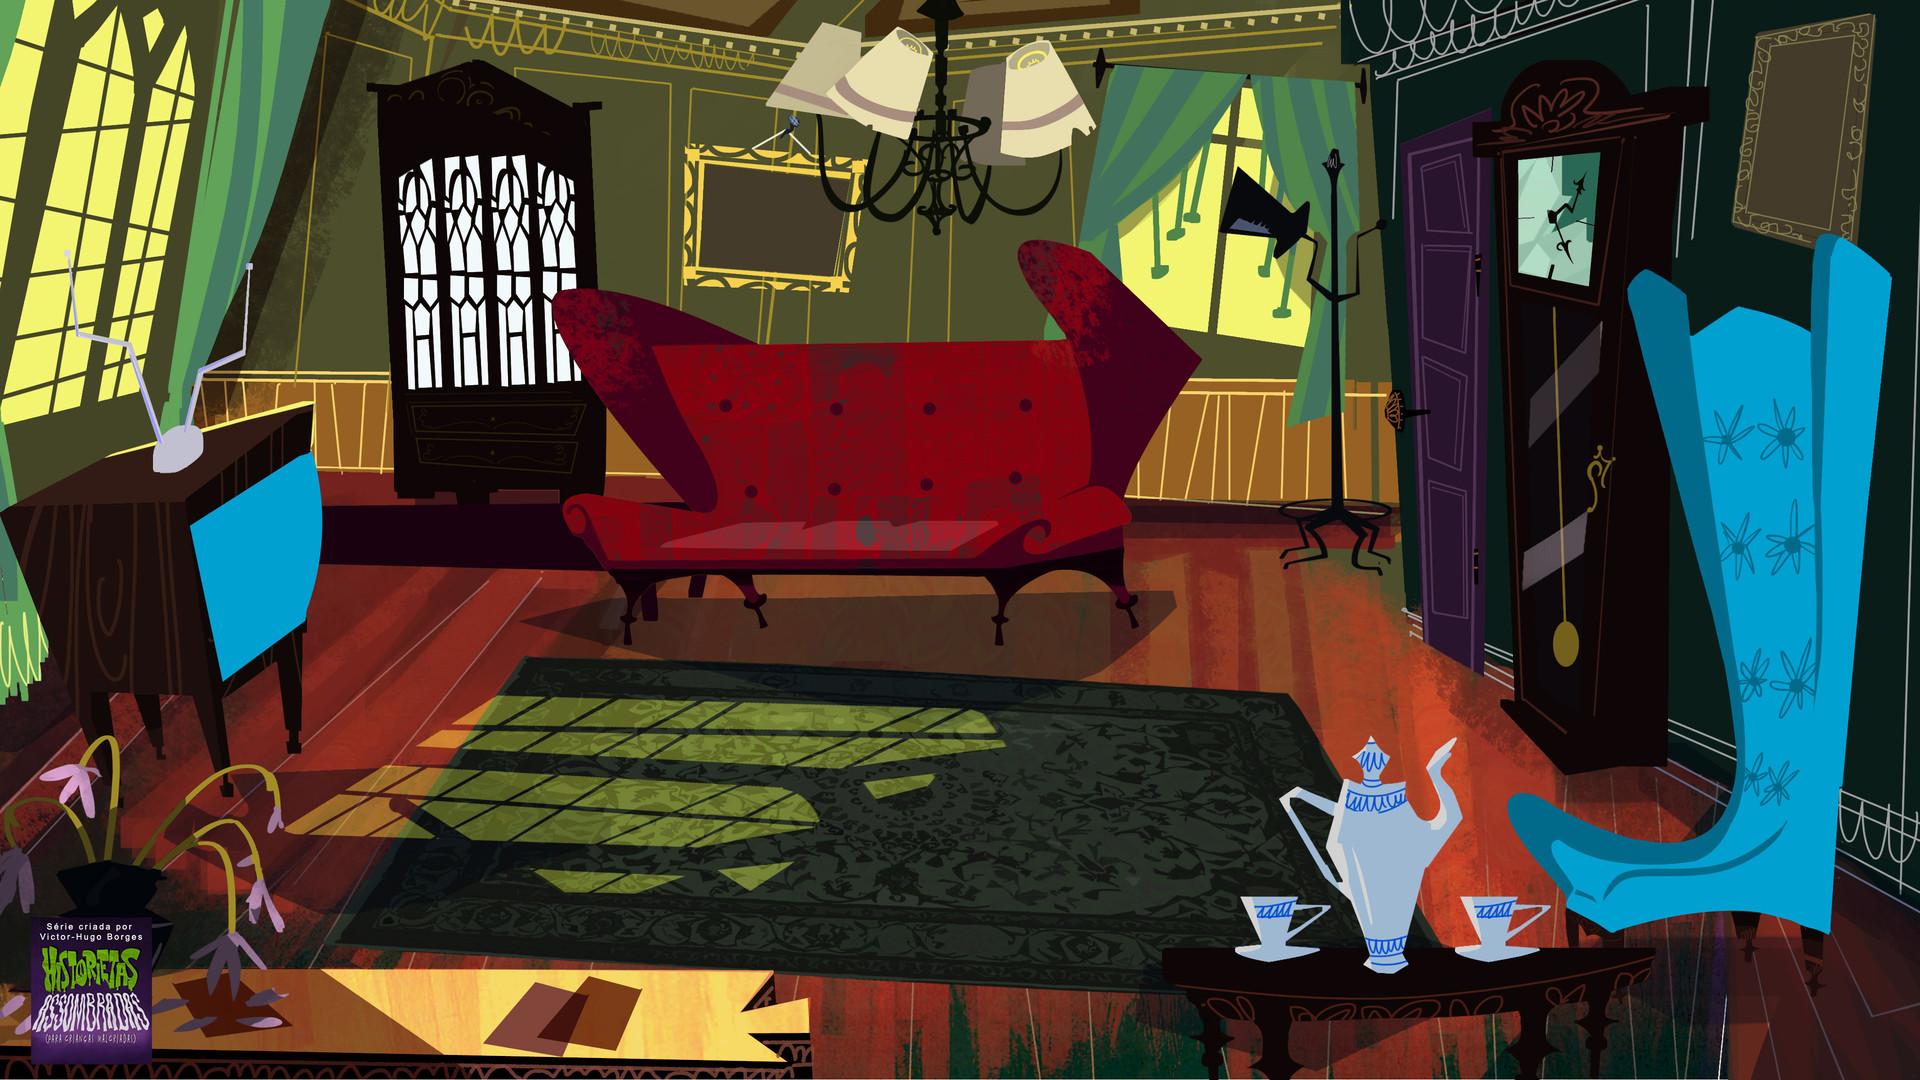 ArtStation  Haunted Tales for Wicked Kids  Cartoon